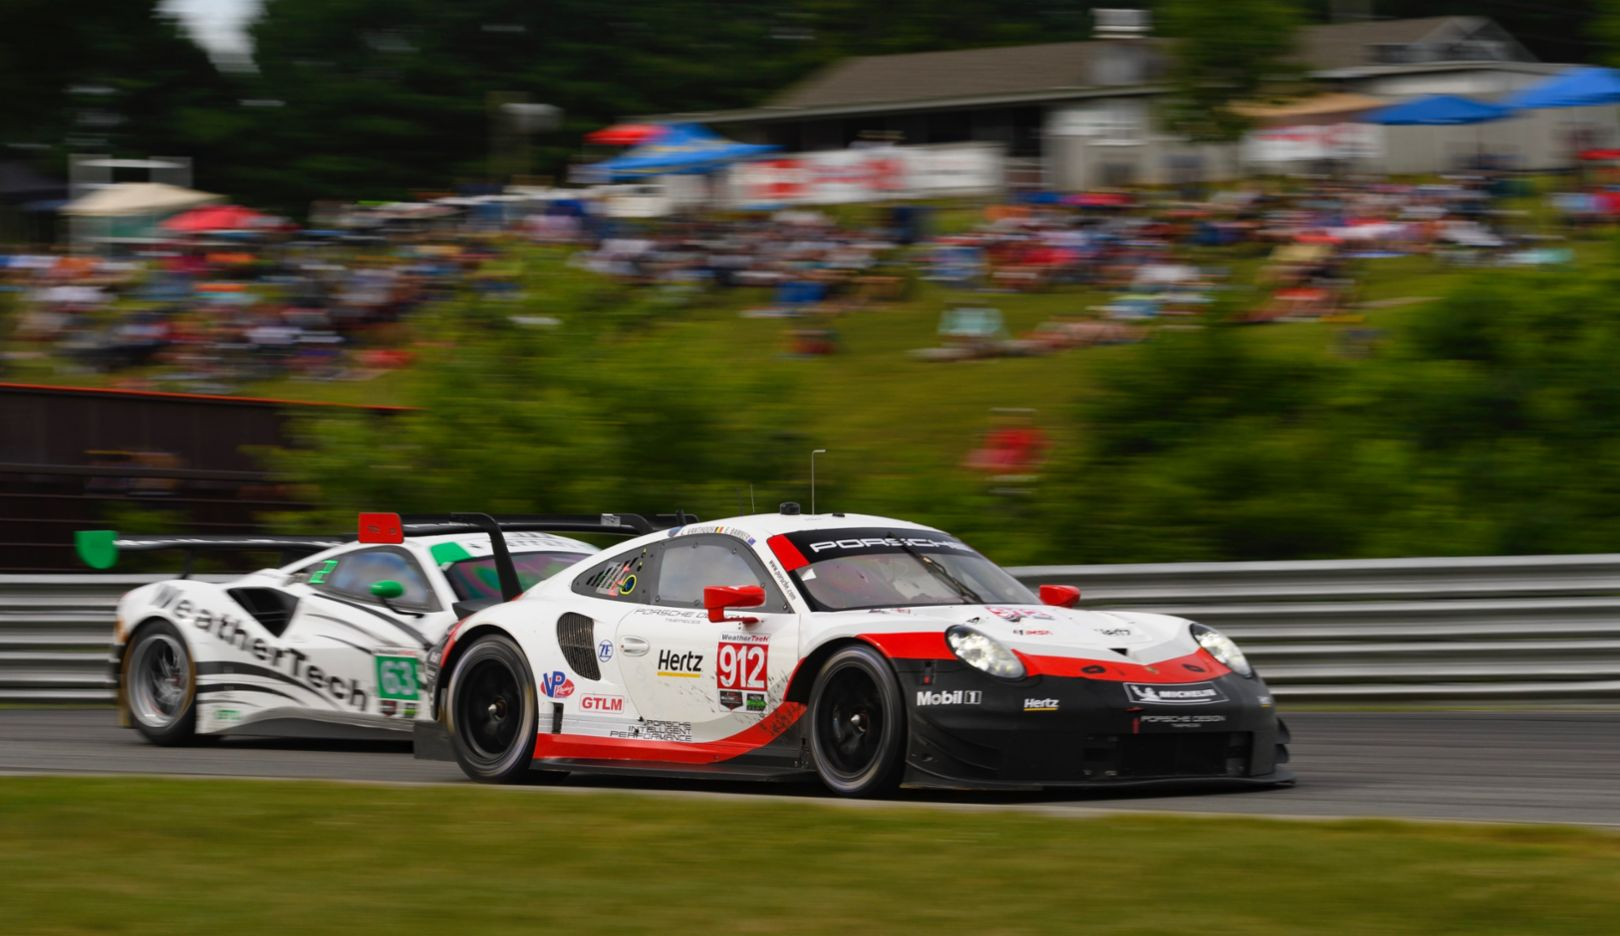 911 RSR, IMSA WeatherTech SportsCar Championship, Lime Rock Park, Rennen, 2018, Porsche AG